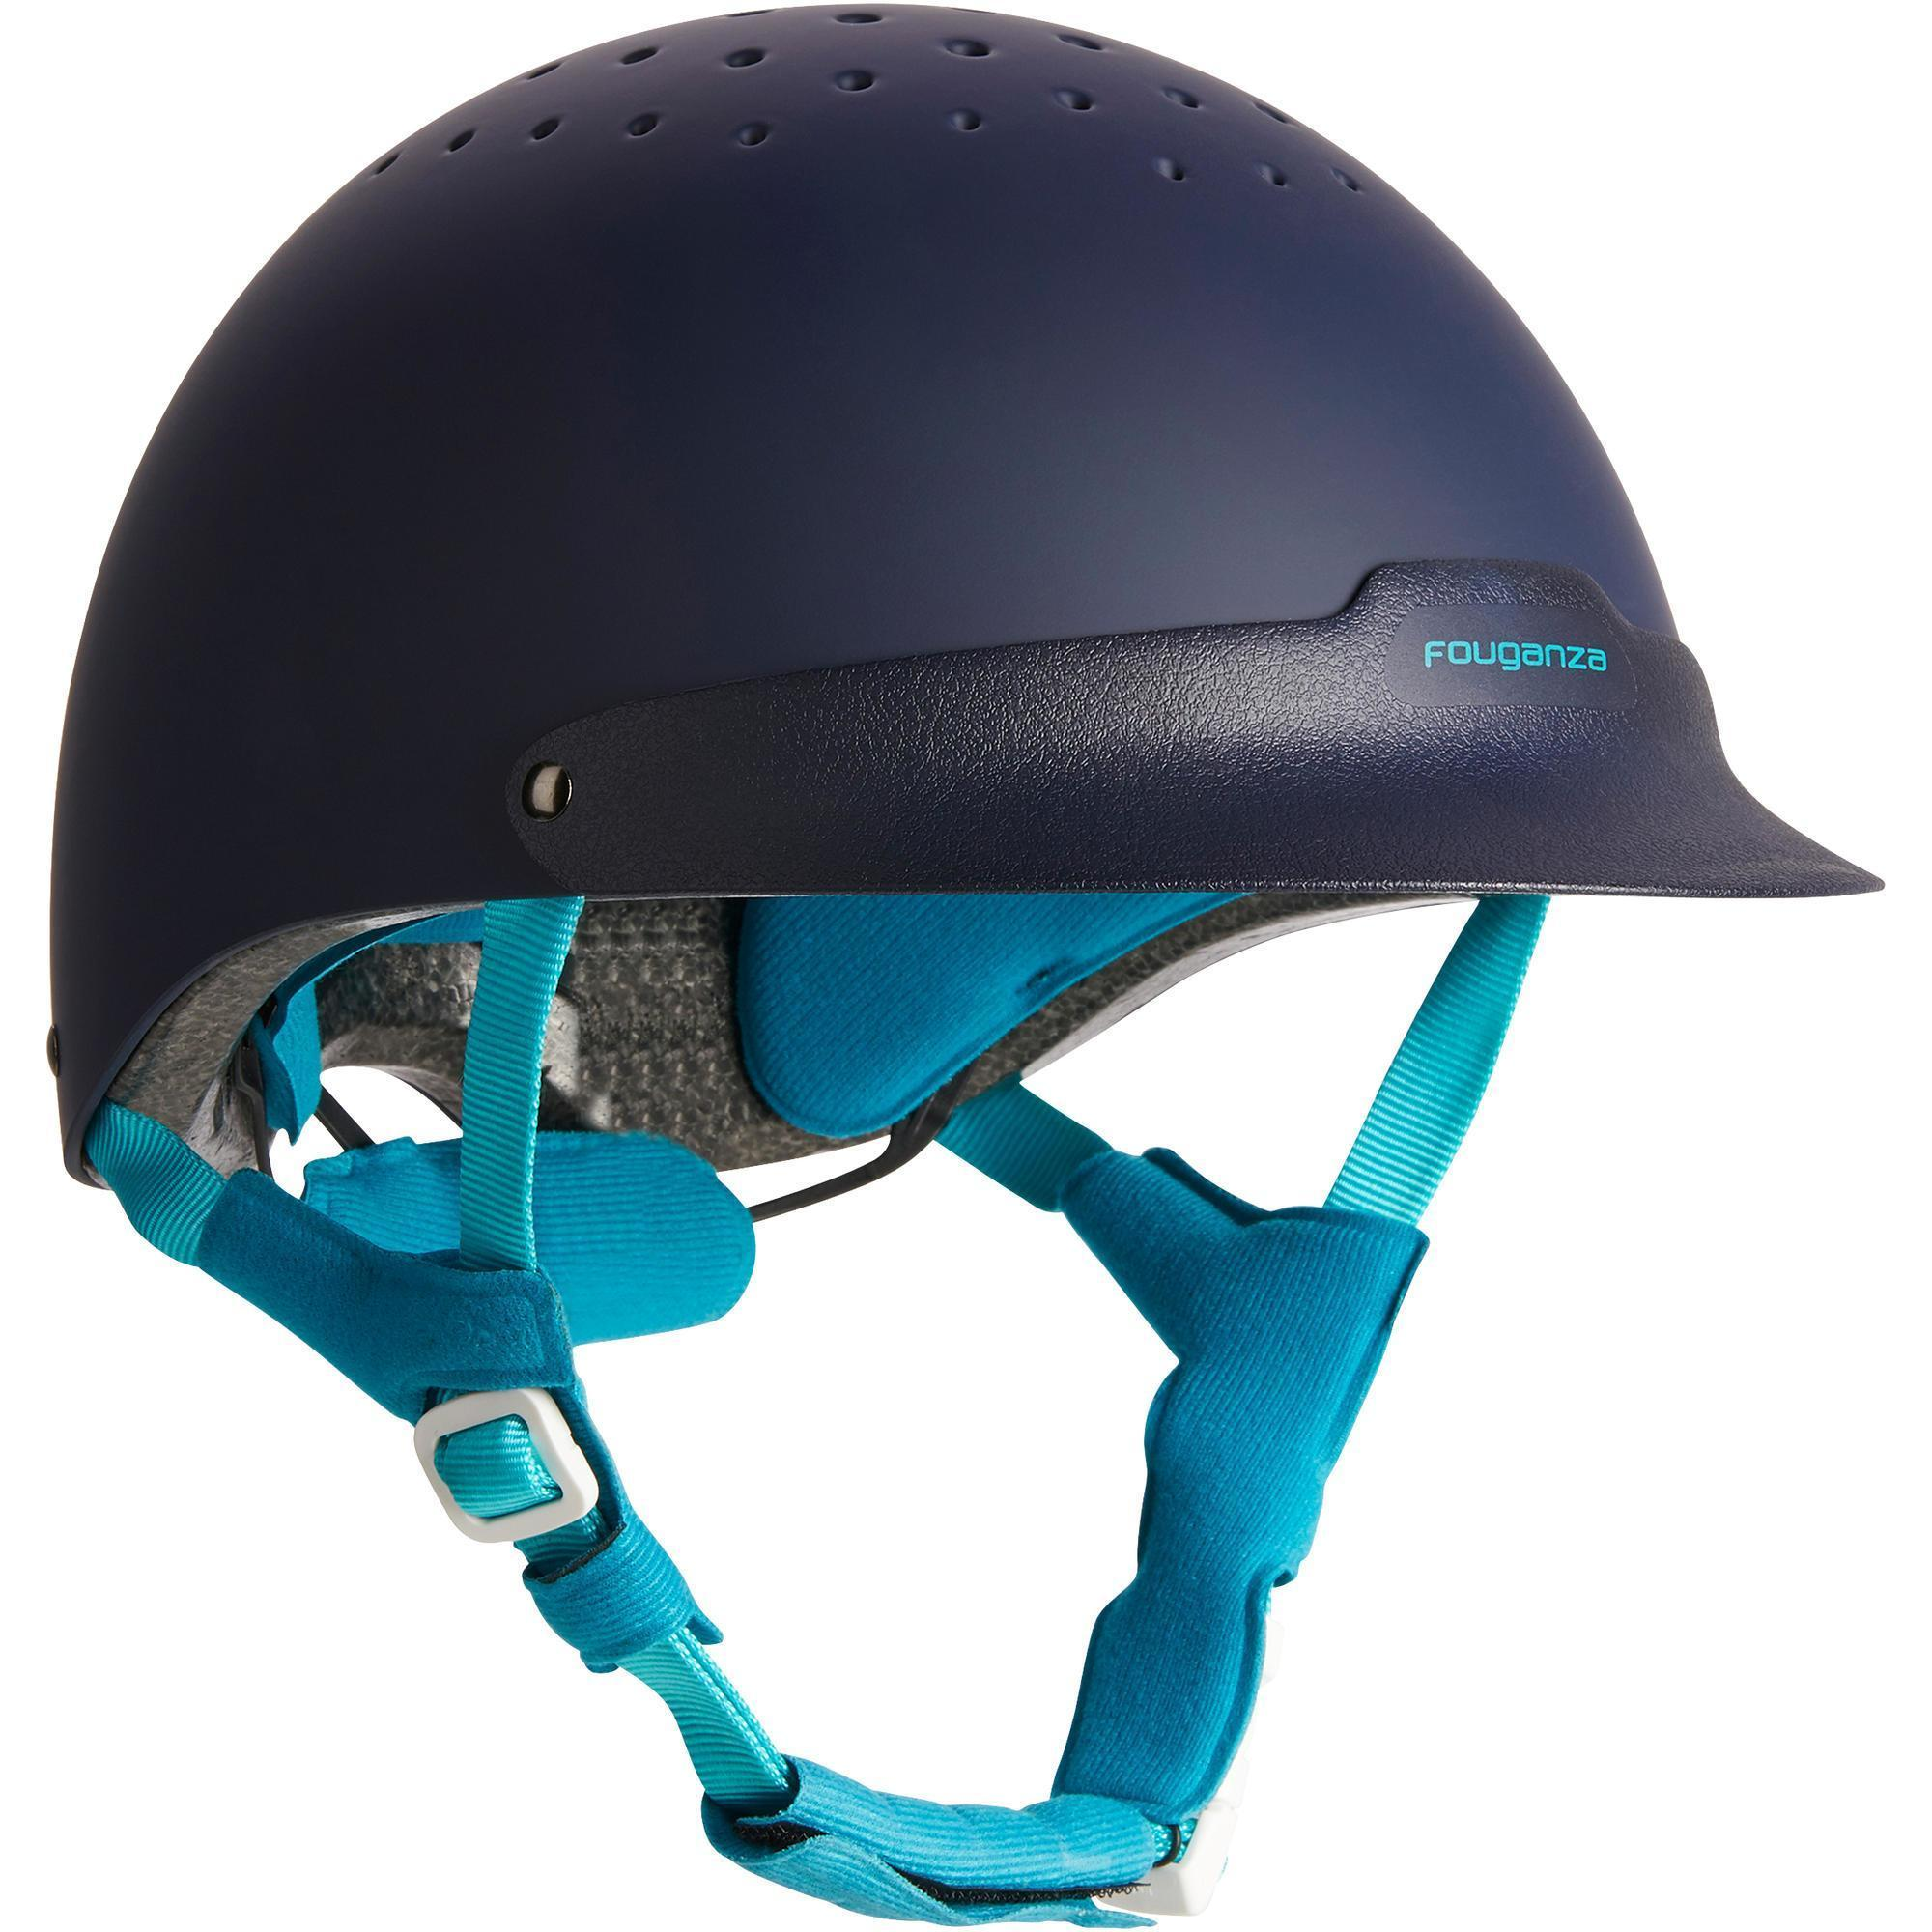 Horse Riding Helmet Safety Standards Uk